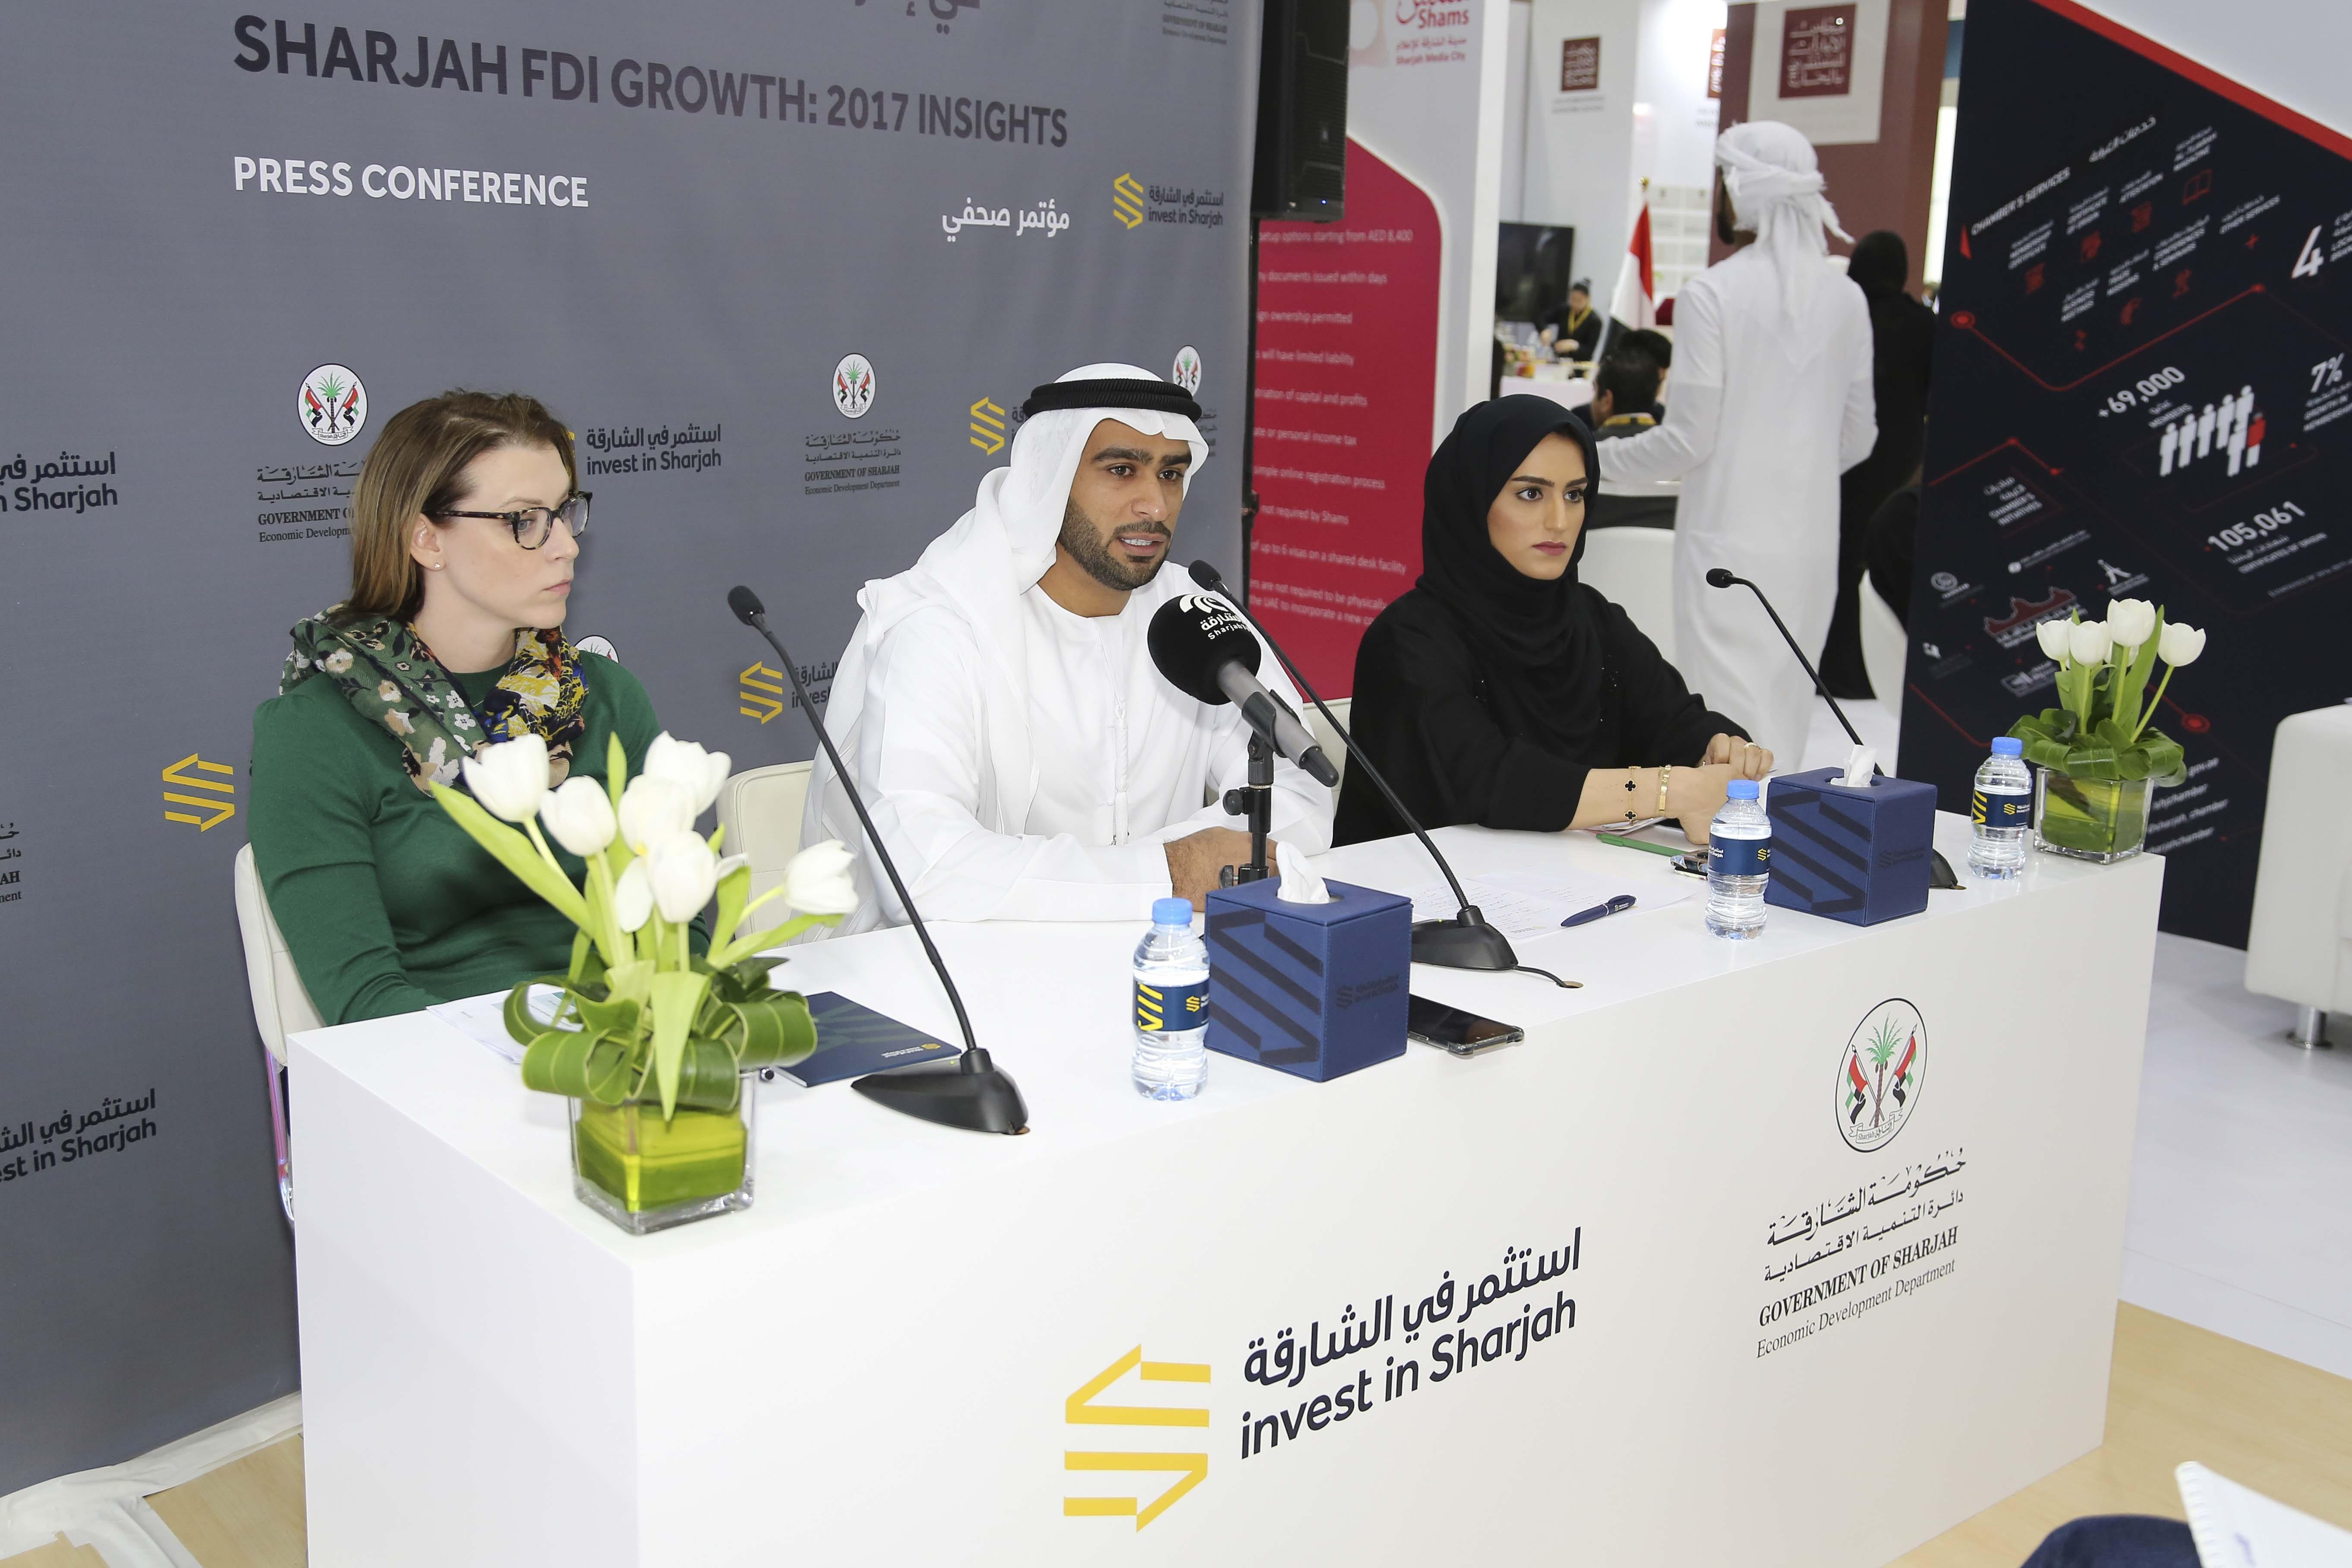 Sharjah attracts $1.62 billion FDI in 2017